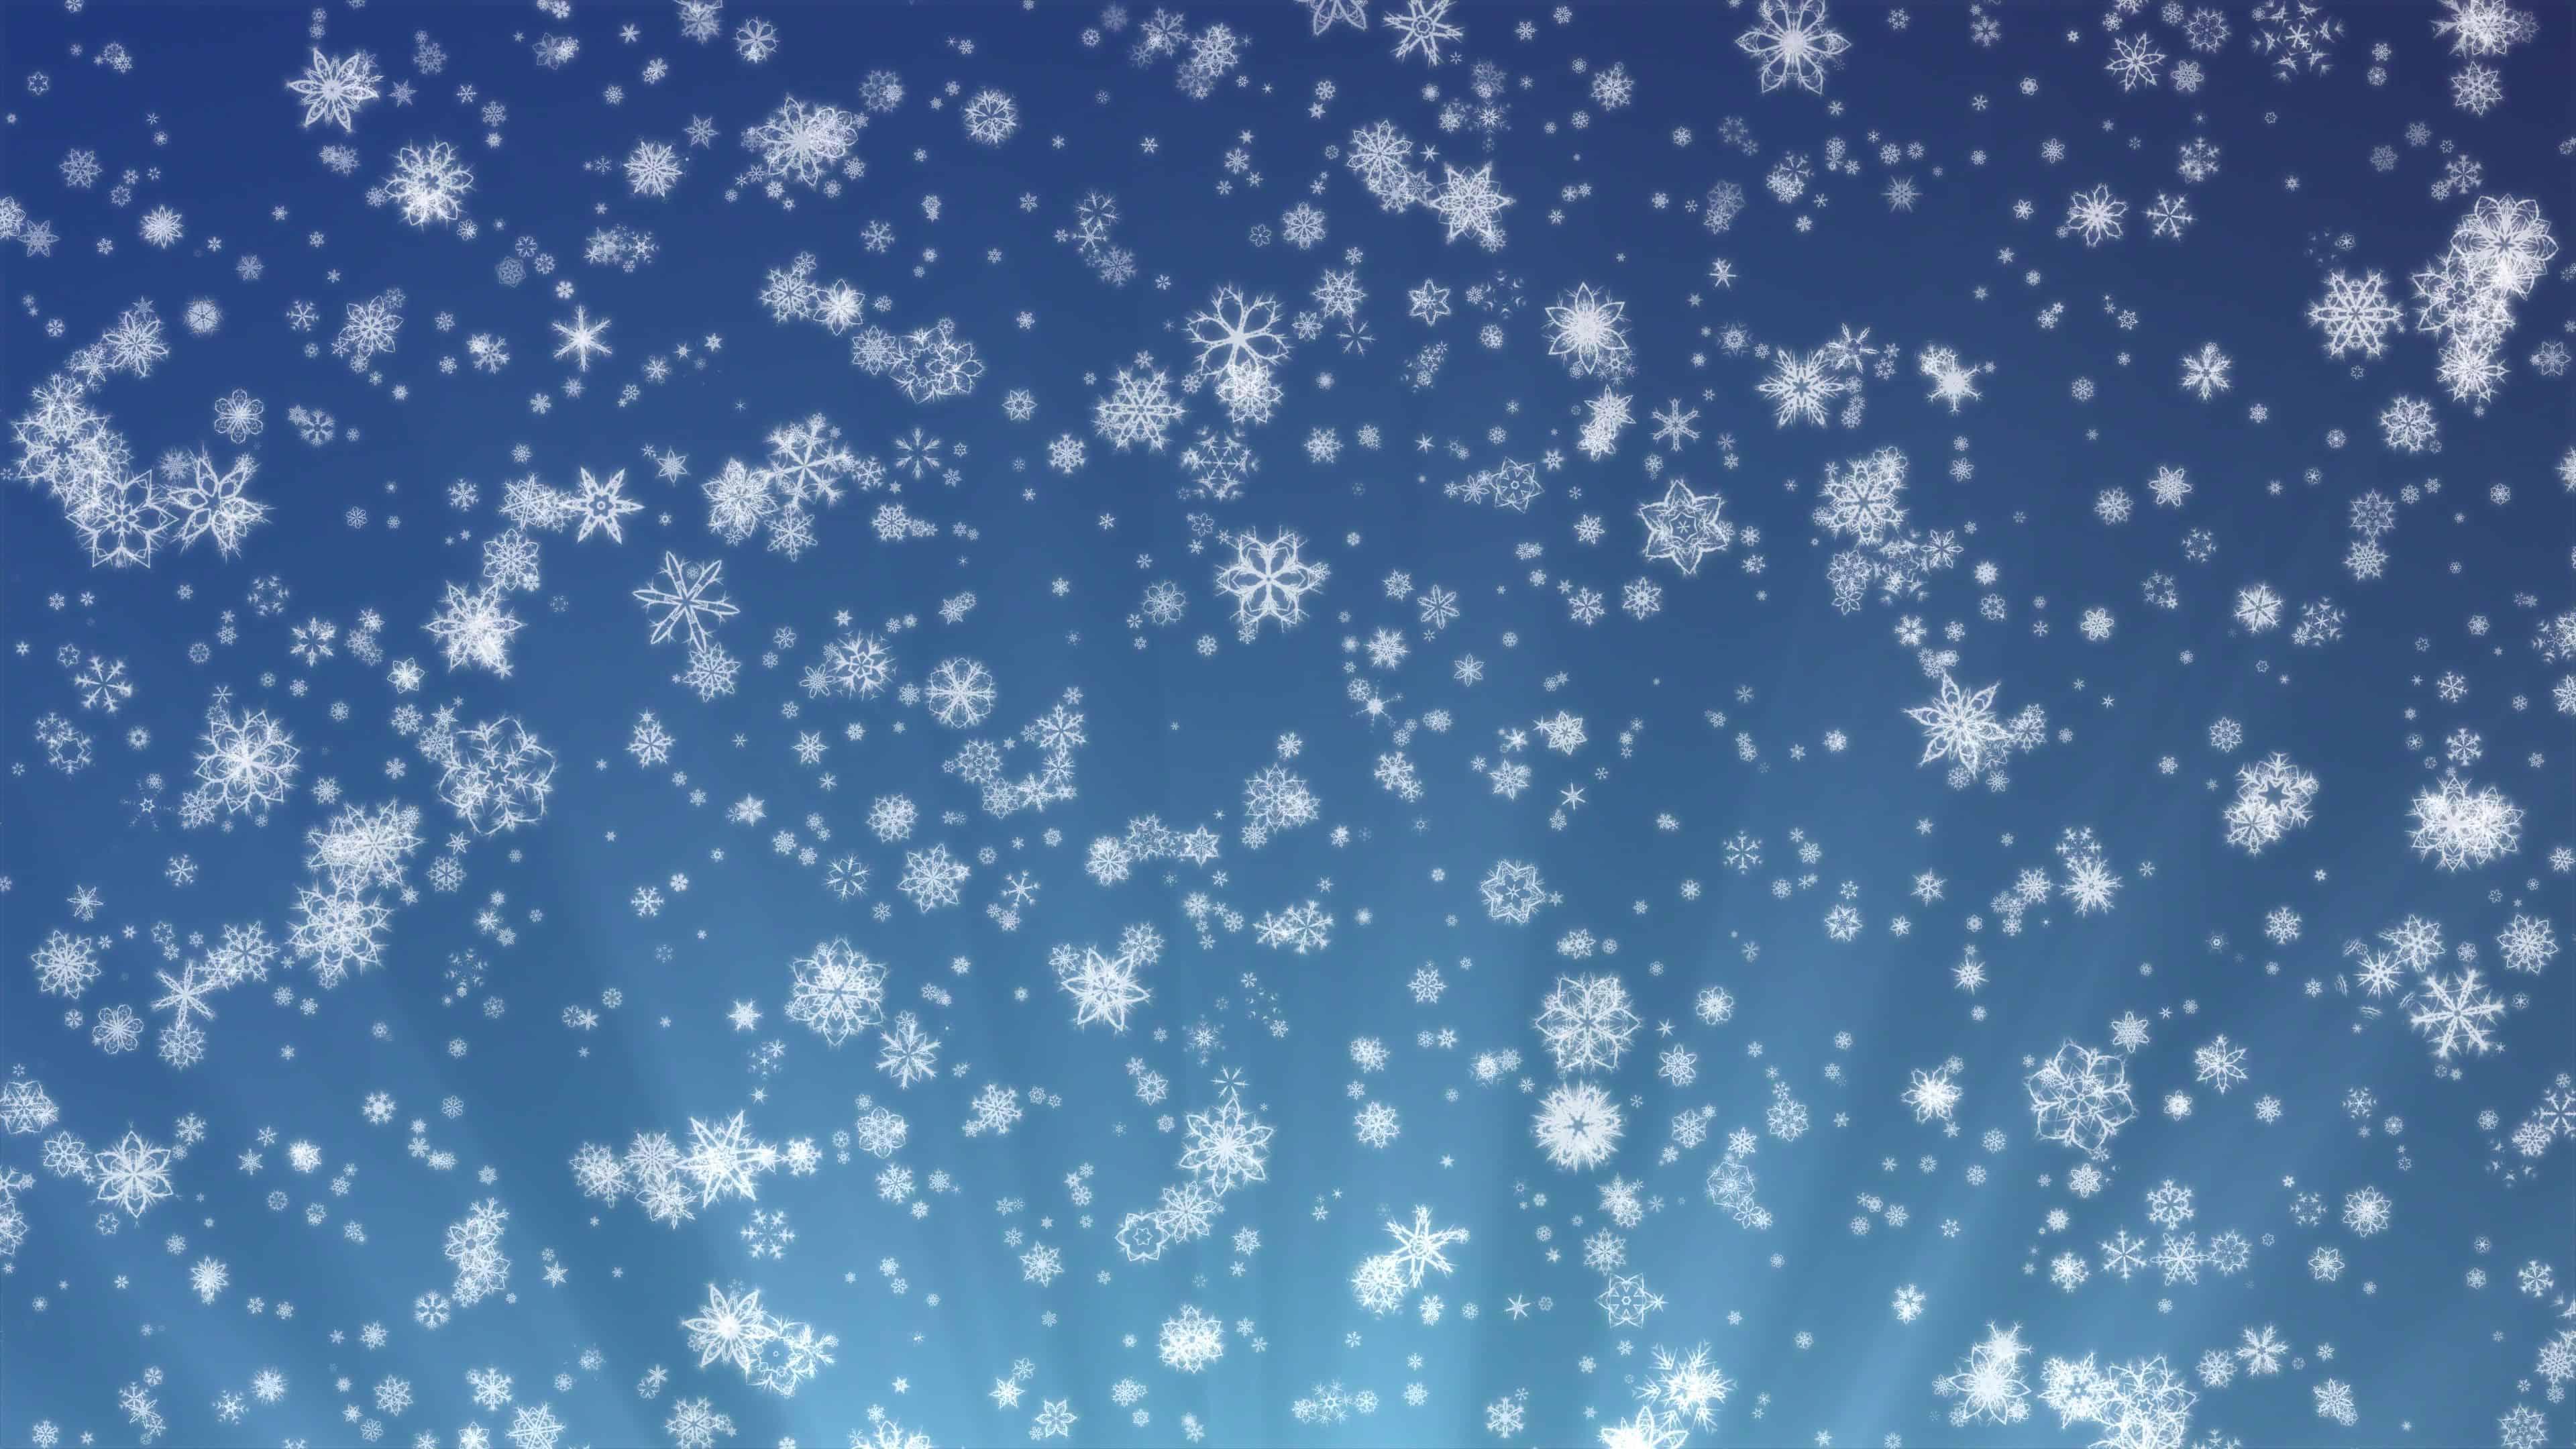 Free Falling Snow Wallpaper Snowflakes On A Blue Background Uhd 4k Wallpaper Pixelz